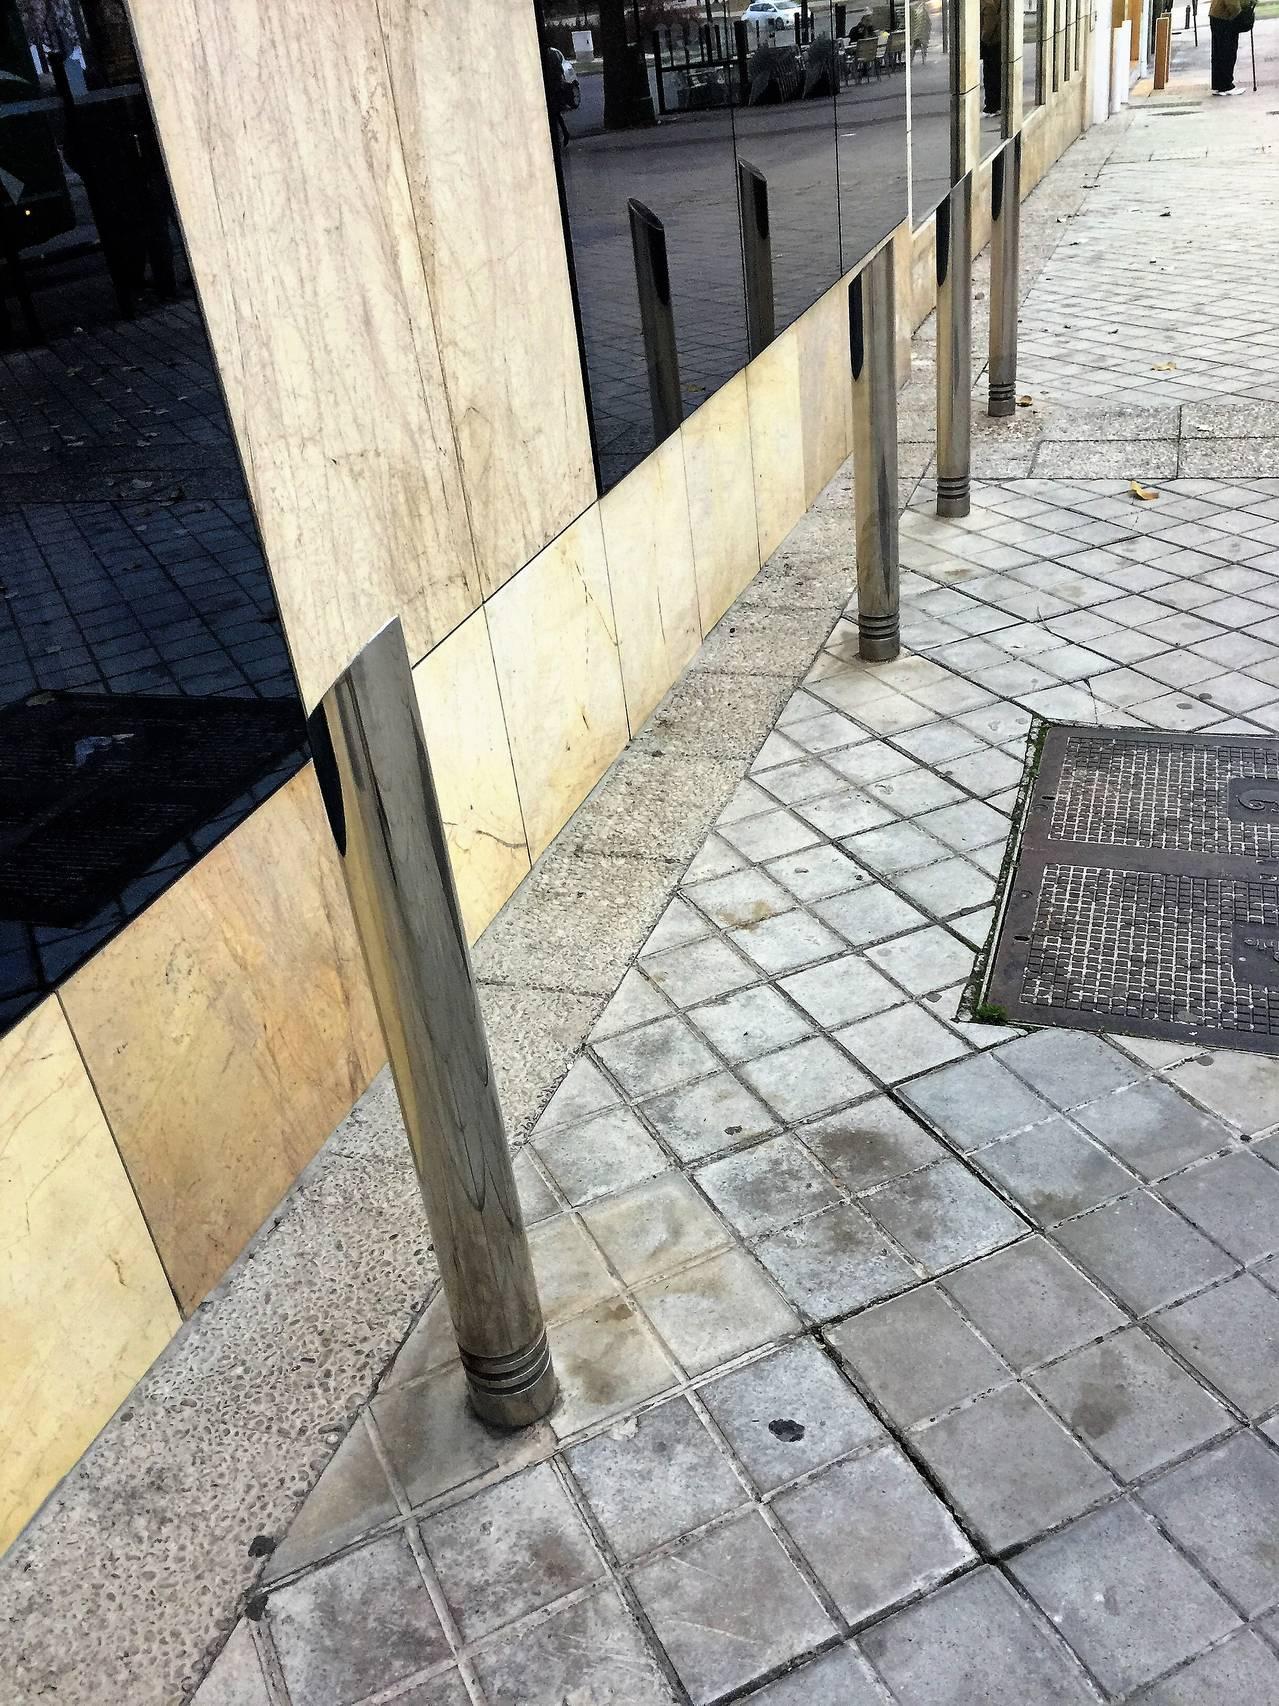 Mobiliario urbano for Mobiliario urbano tipos